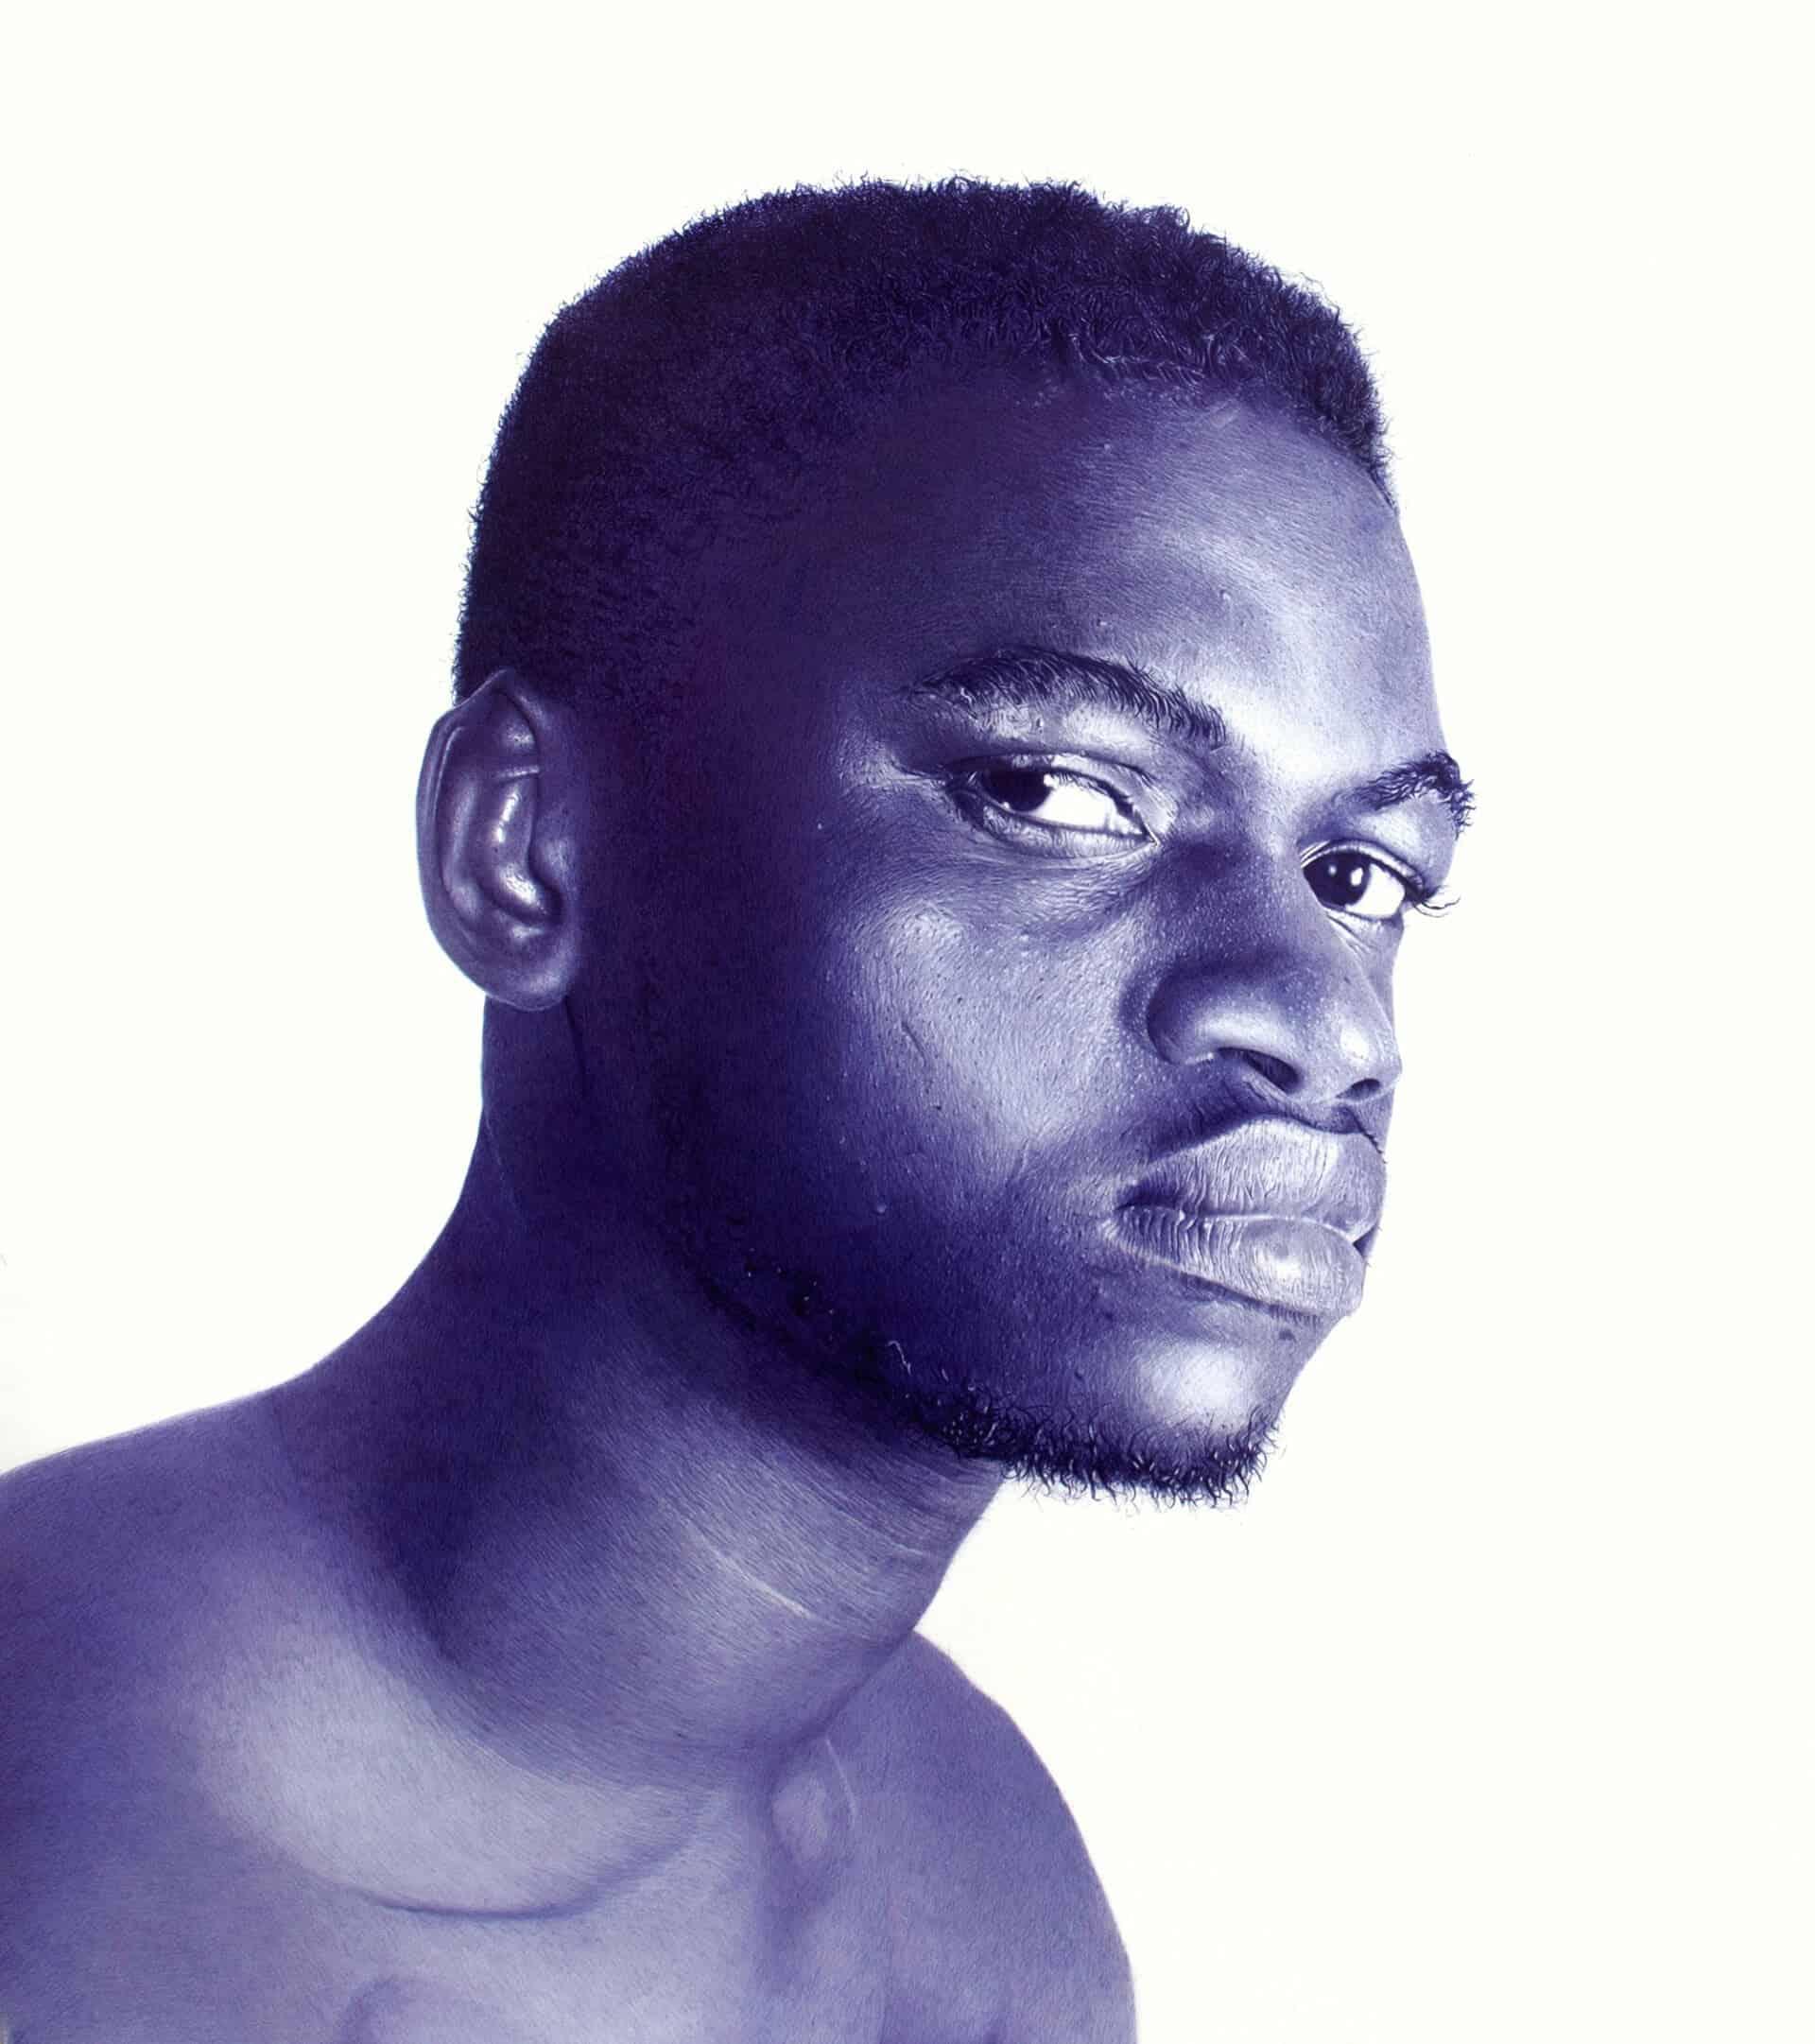 Portret in balpen door Patrick Onyekwere